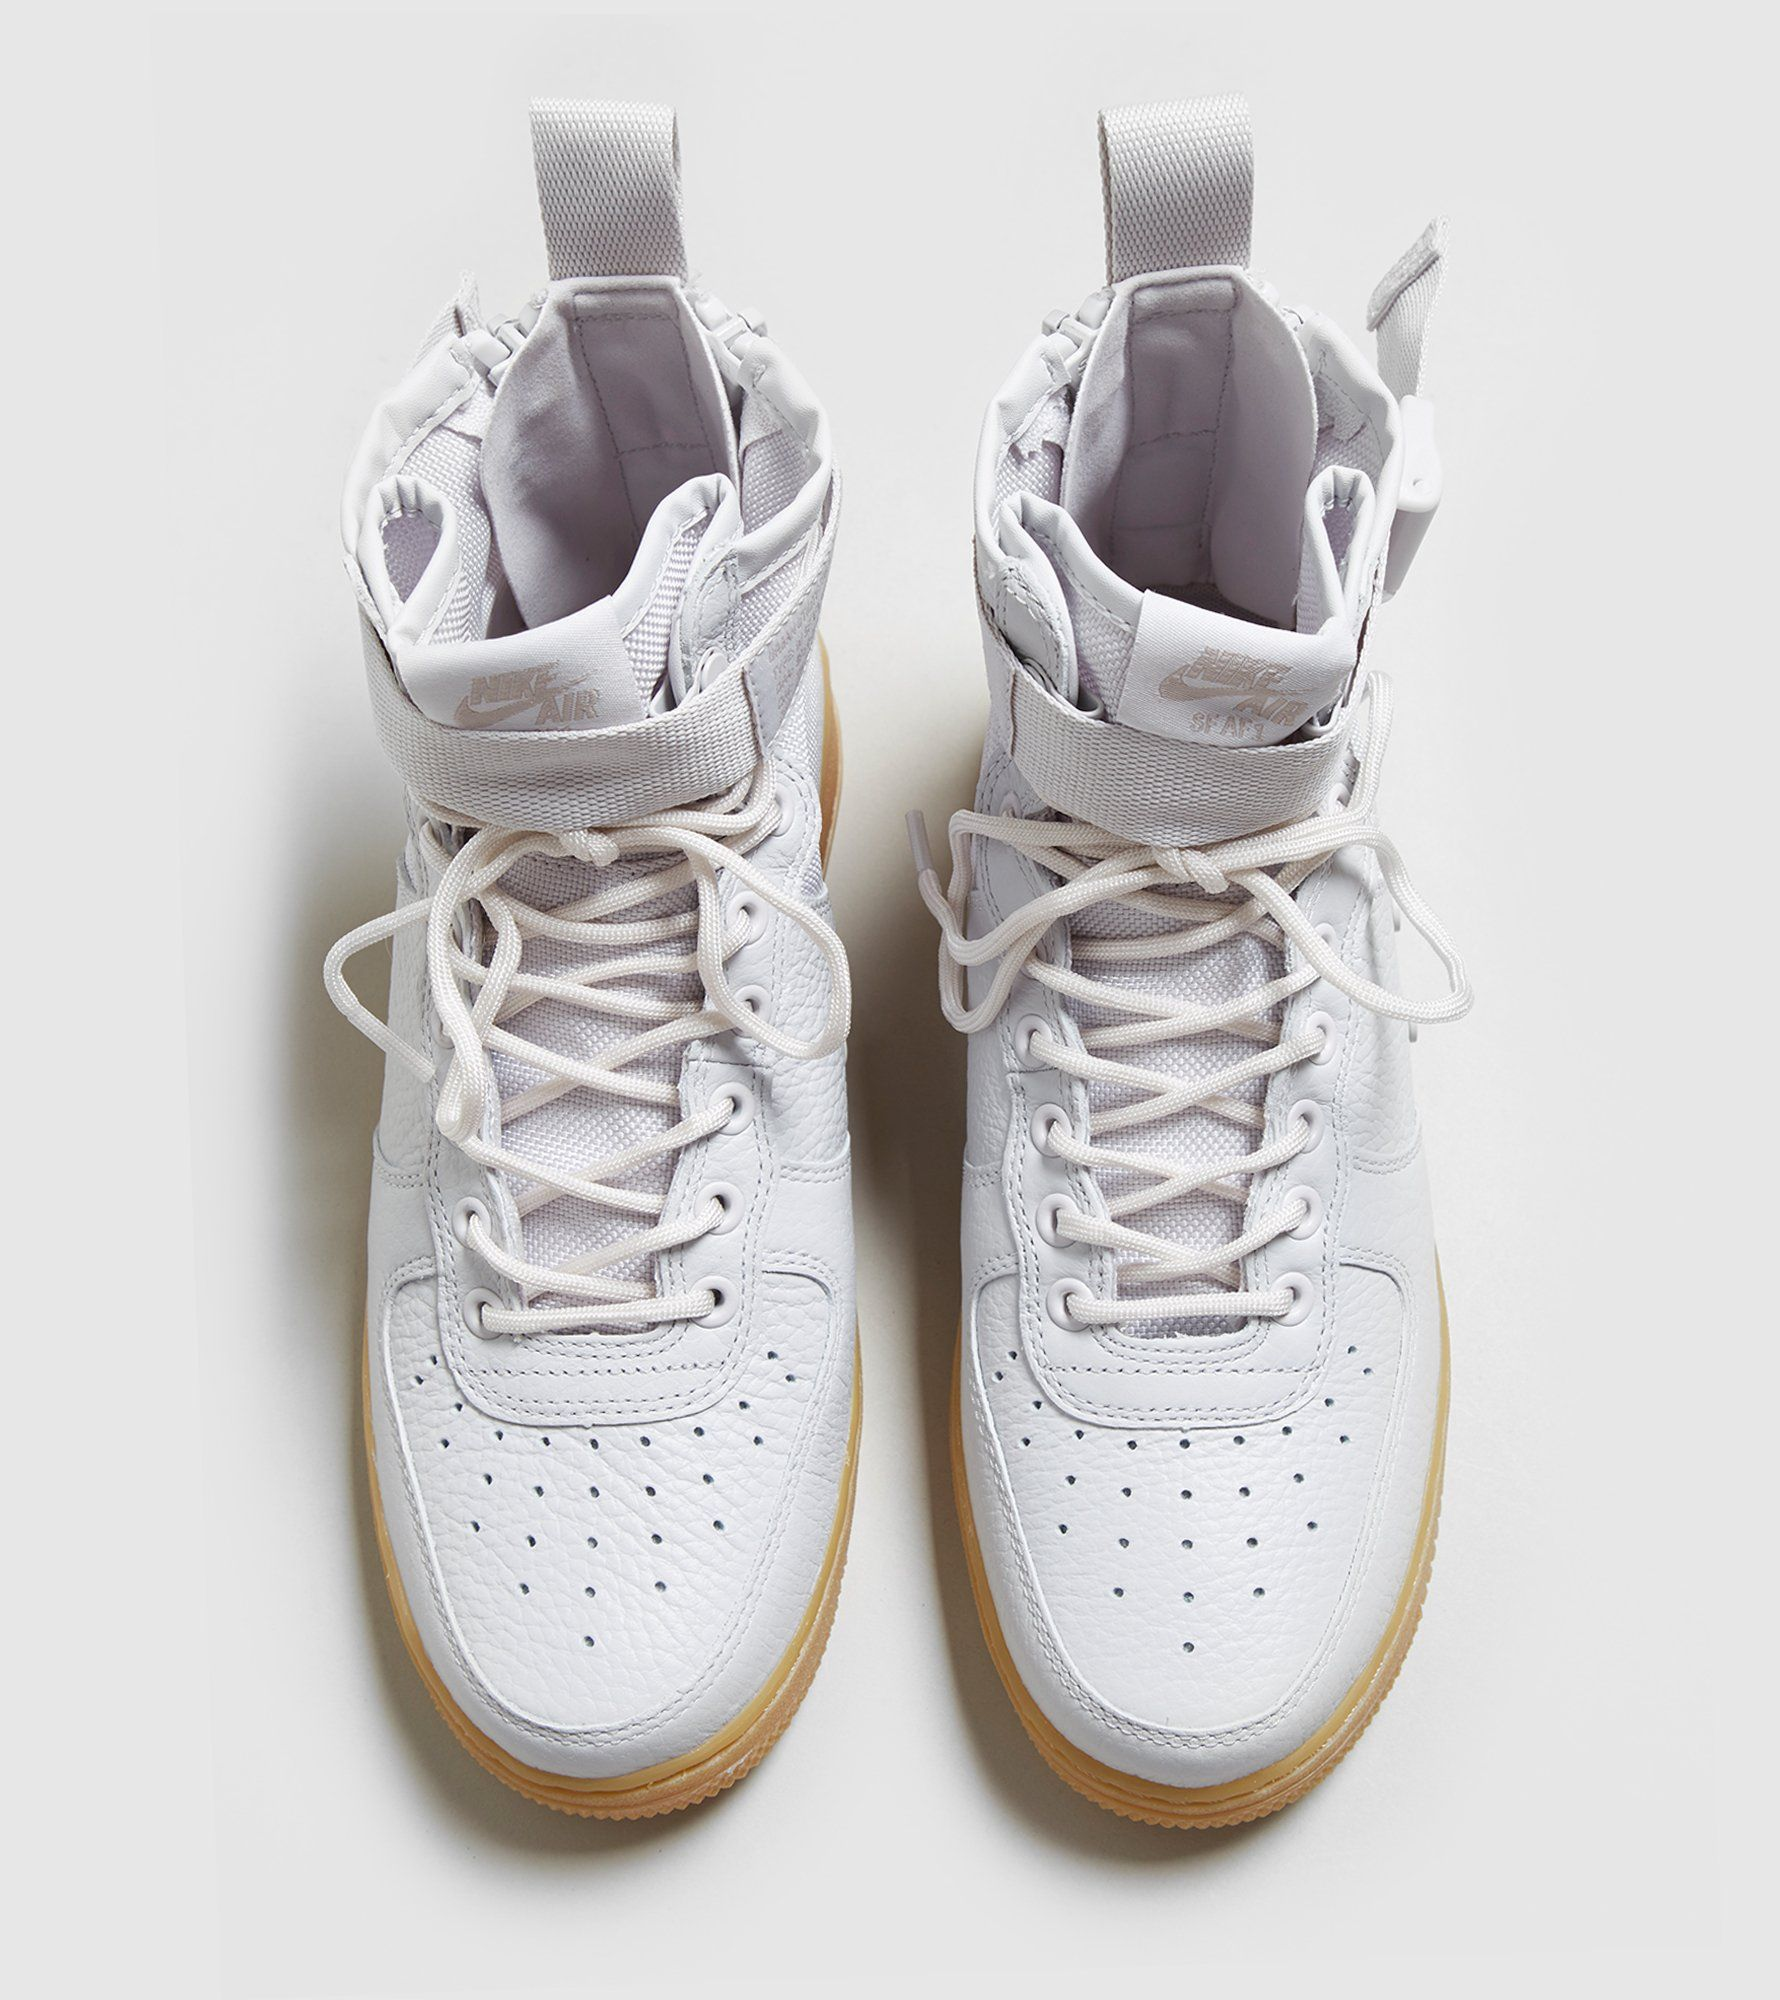 Nike SF Air Force 1 Mid Women's